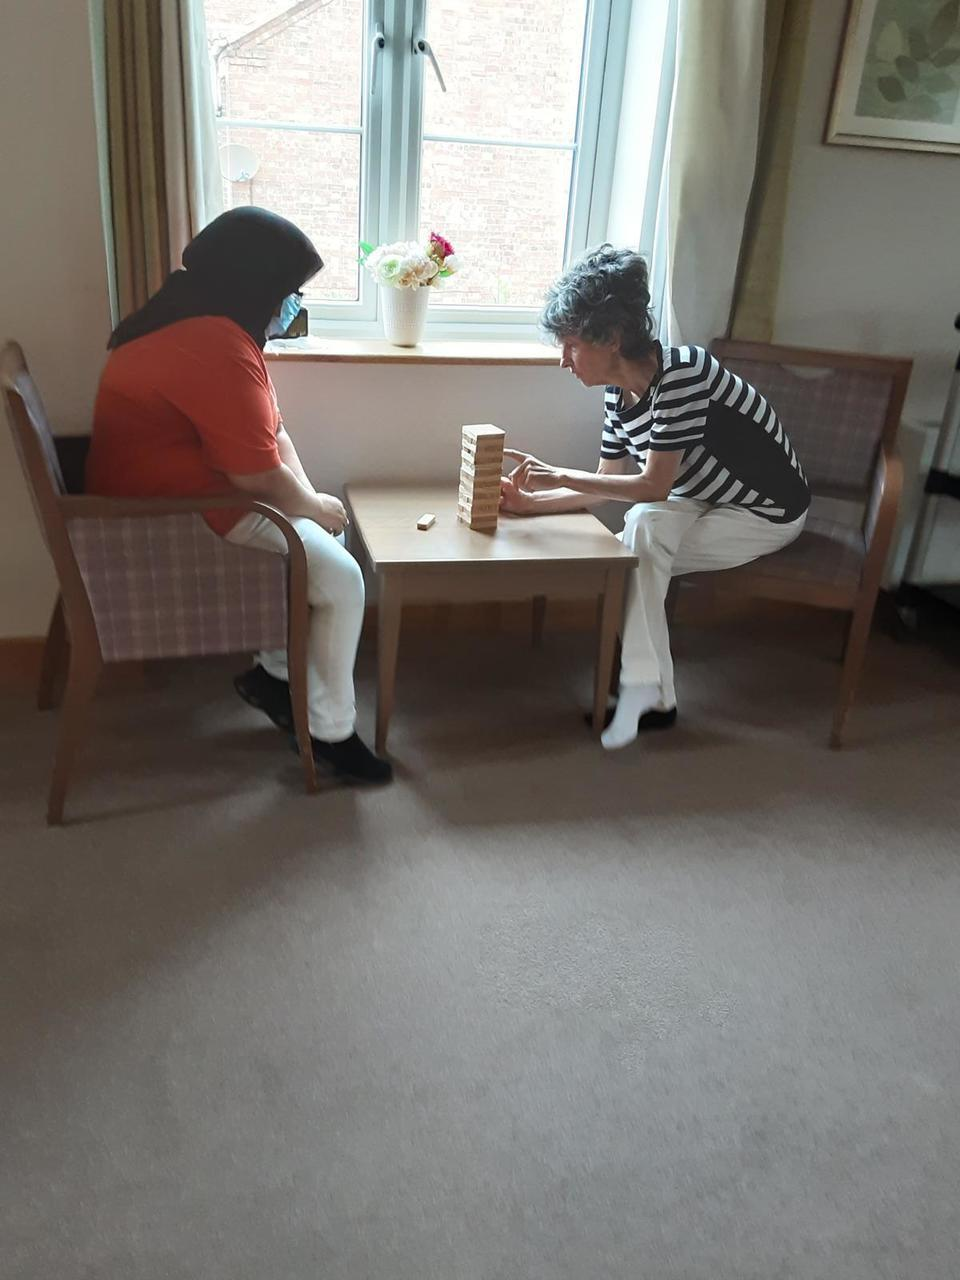 Donation of treats, activities and games | Asda Peterborough